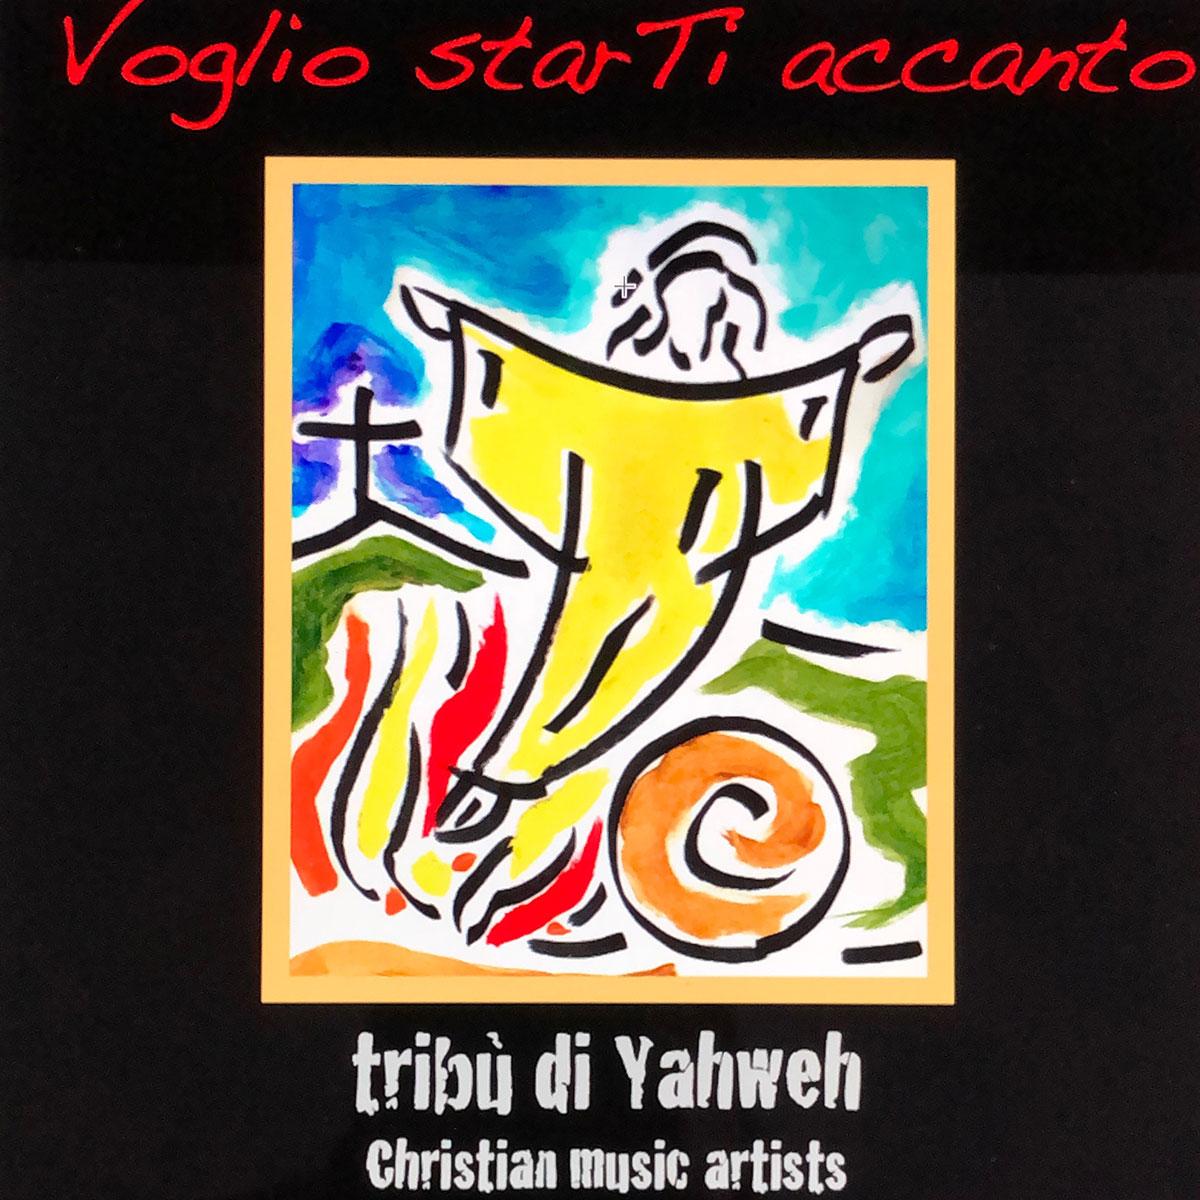 http://www.tribudiyahweh.com/wp/wp-content/uploads/2019/02/Voglio-starTi-accanto.jpg